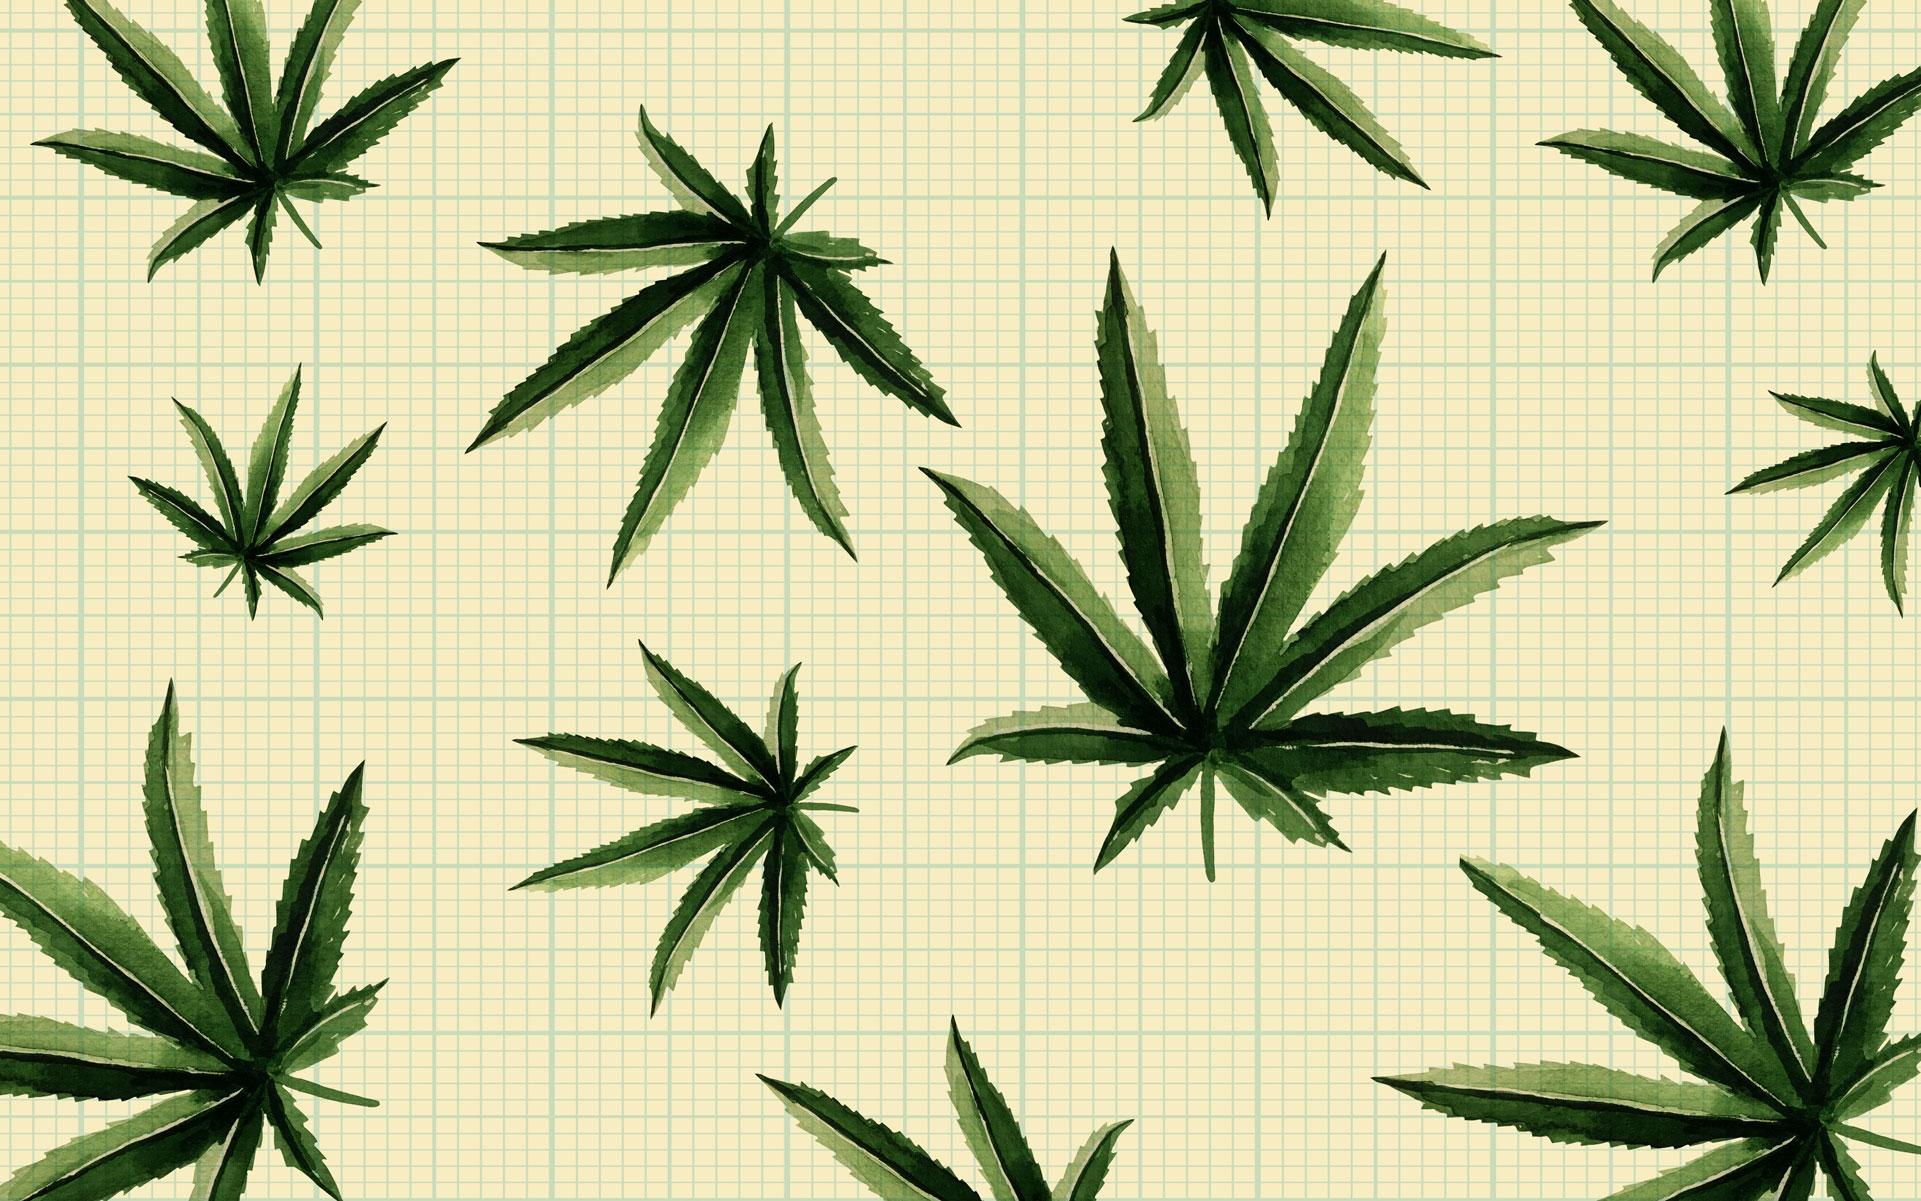 Are High-CBD Hemp Flowers the Next Big Thing in Cannabis